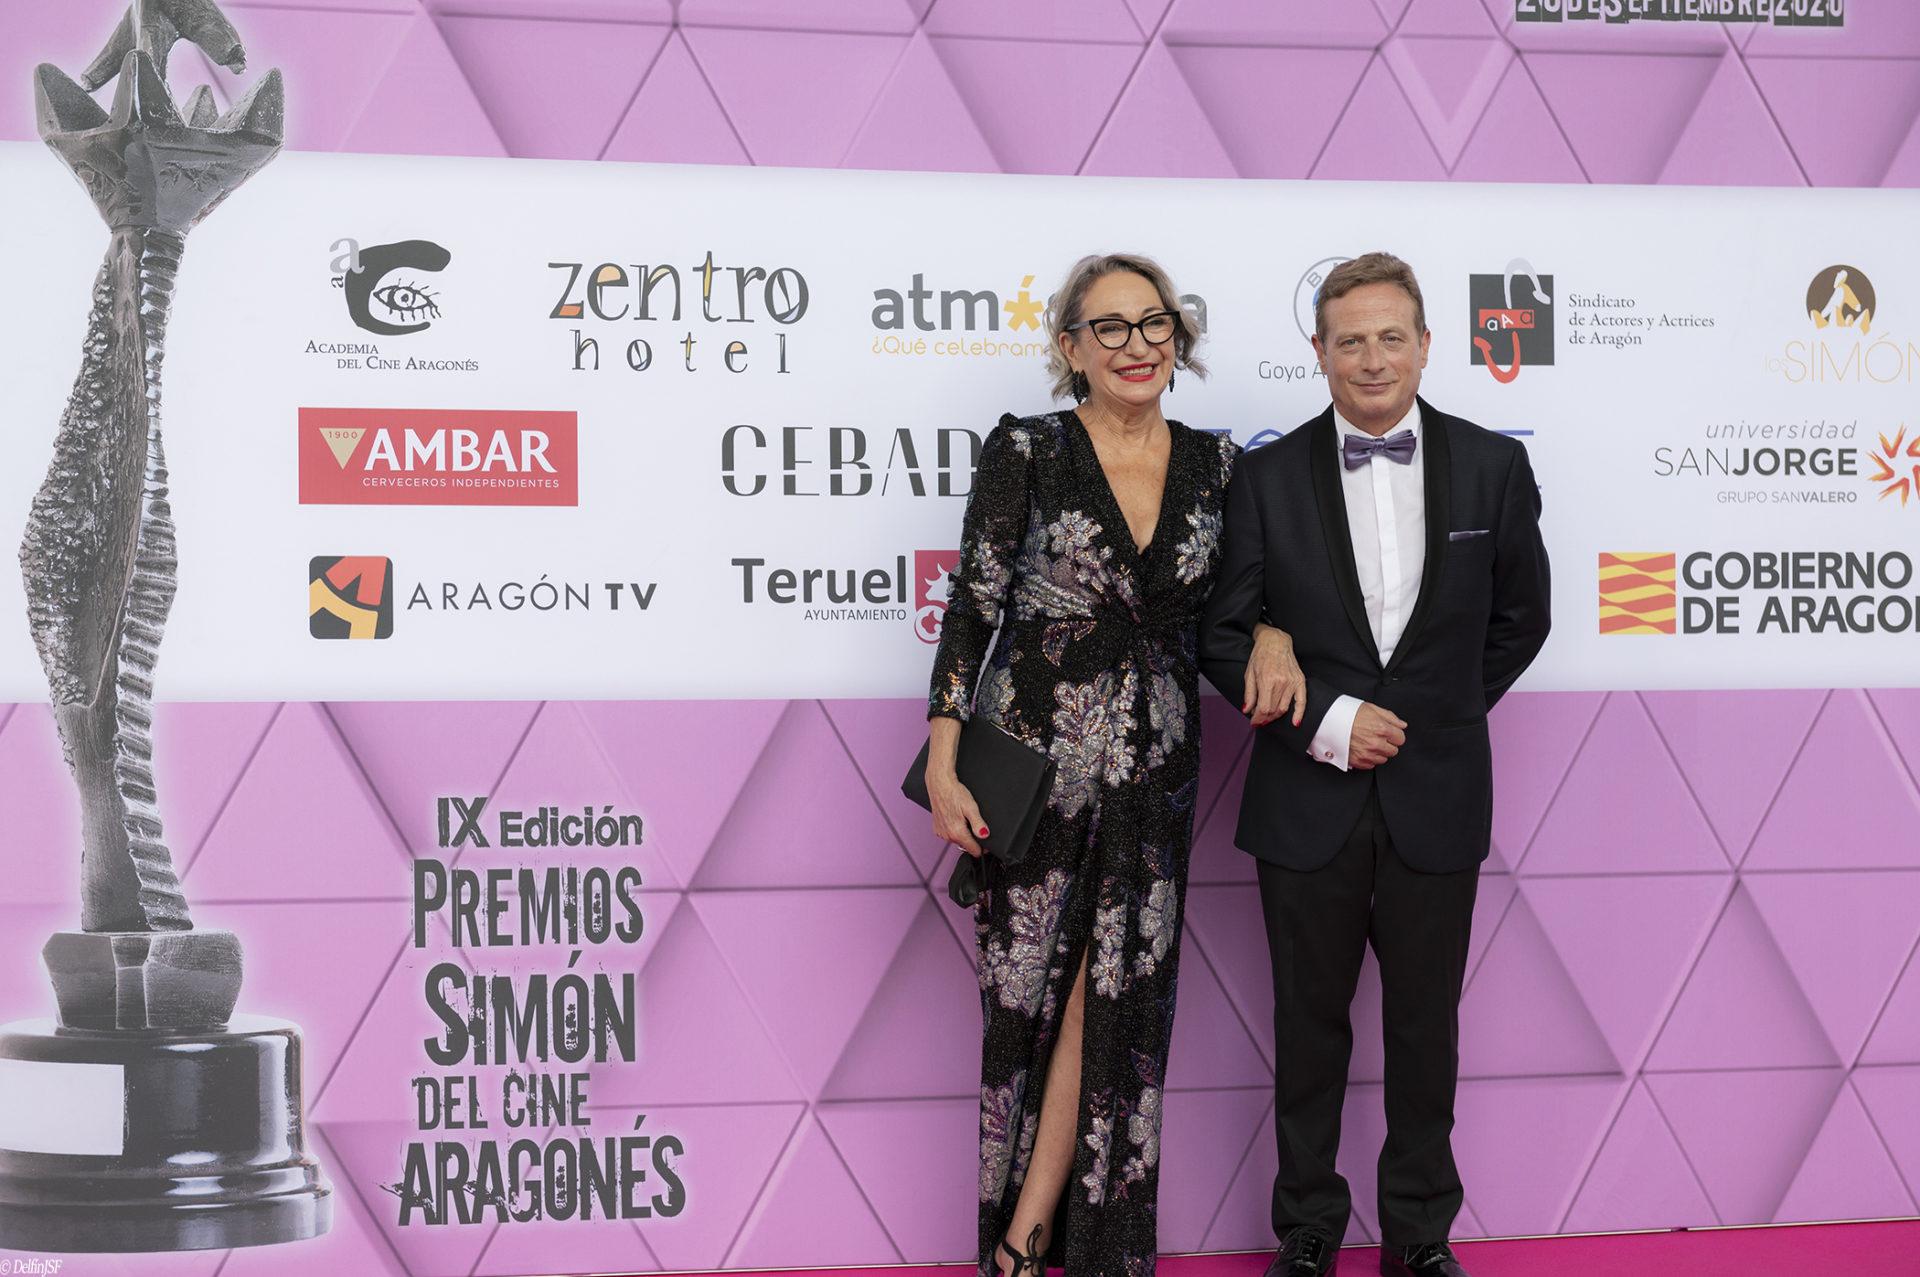 IX PREMIOS SIMÓN DEL CINE ARAGONÉS, DelfínJSF